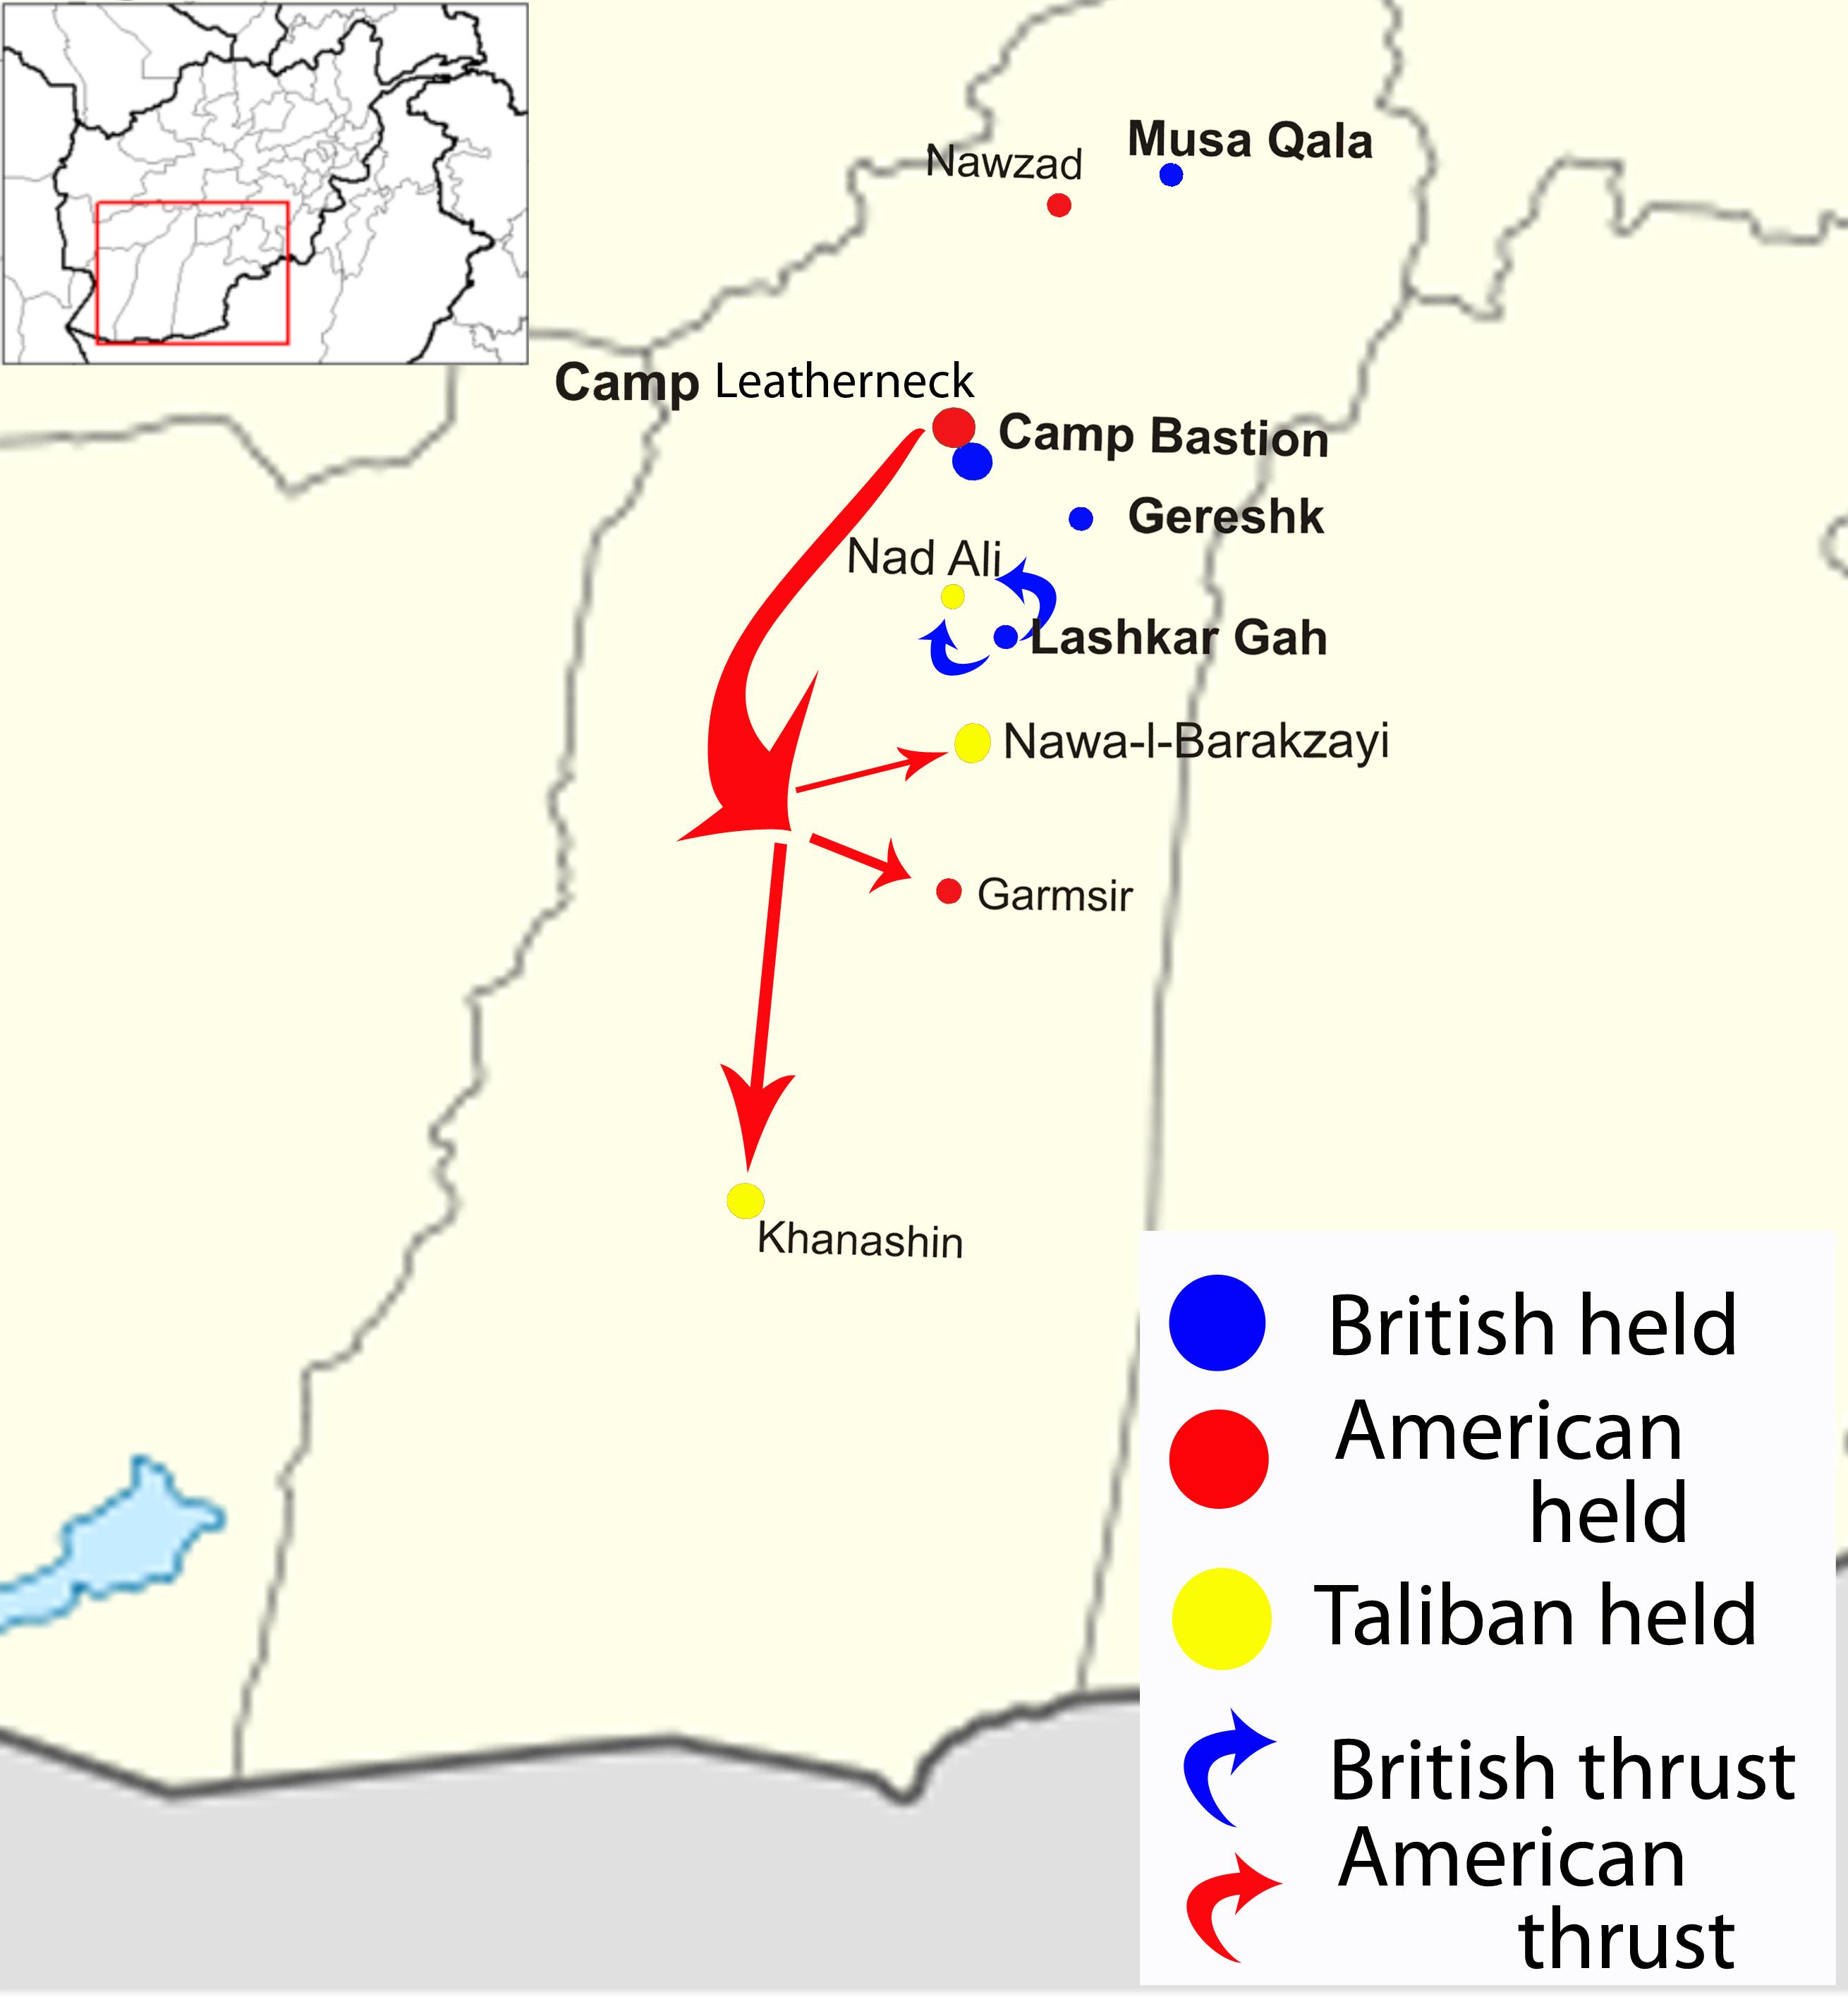 fob lightning afghanistan map Operation Strike Of The Sword Wikipedia fob lightning afghanistan map